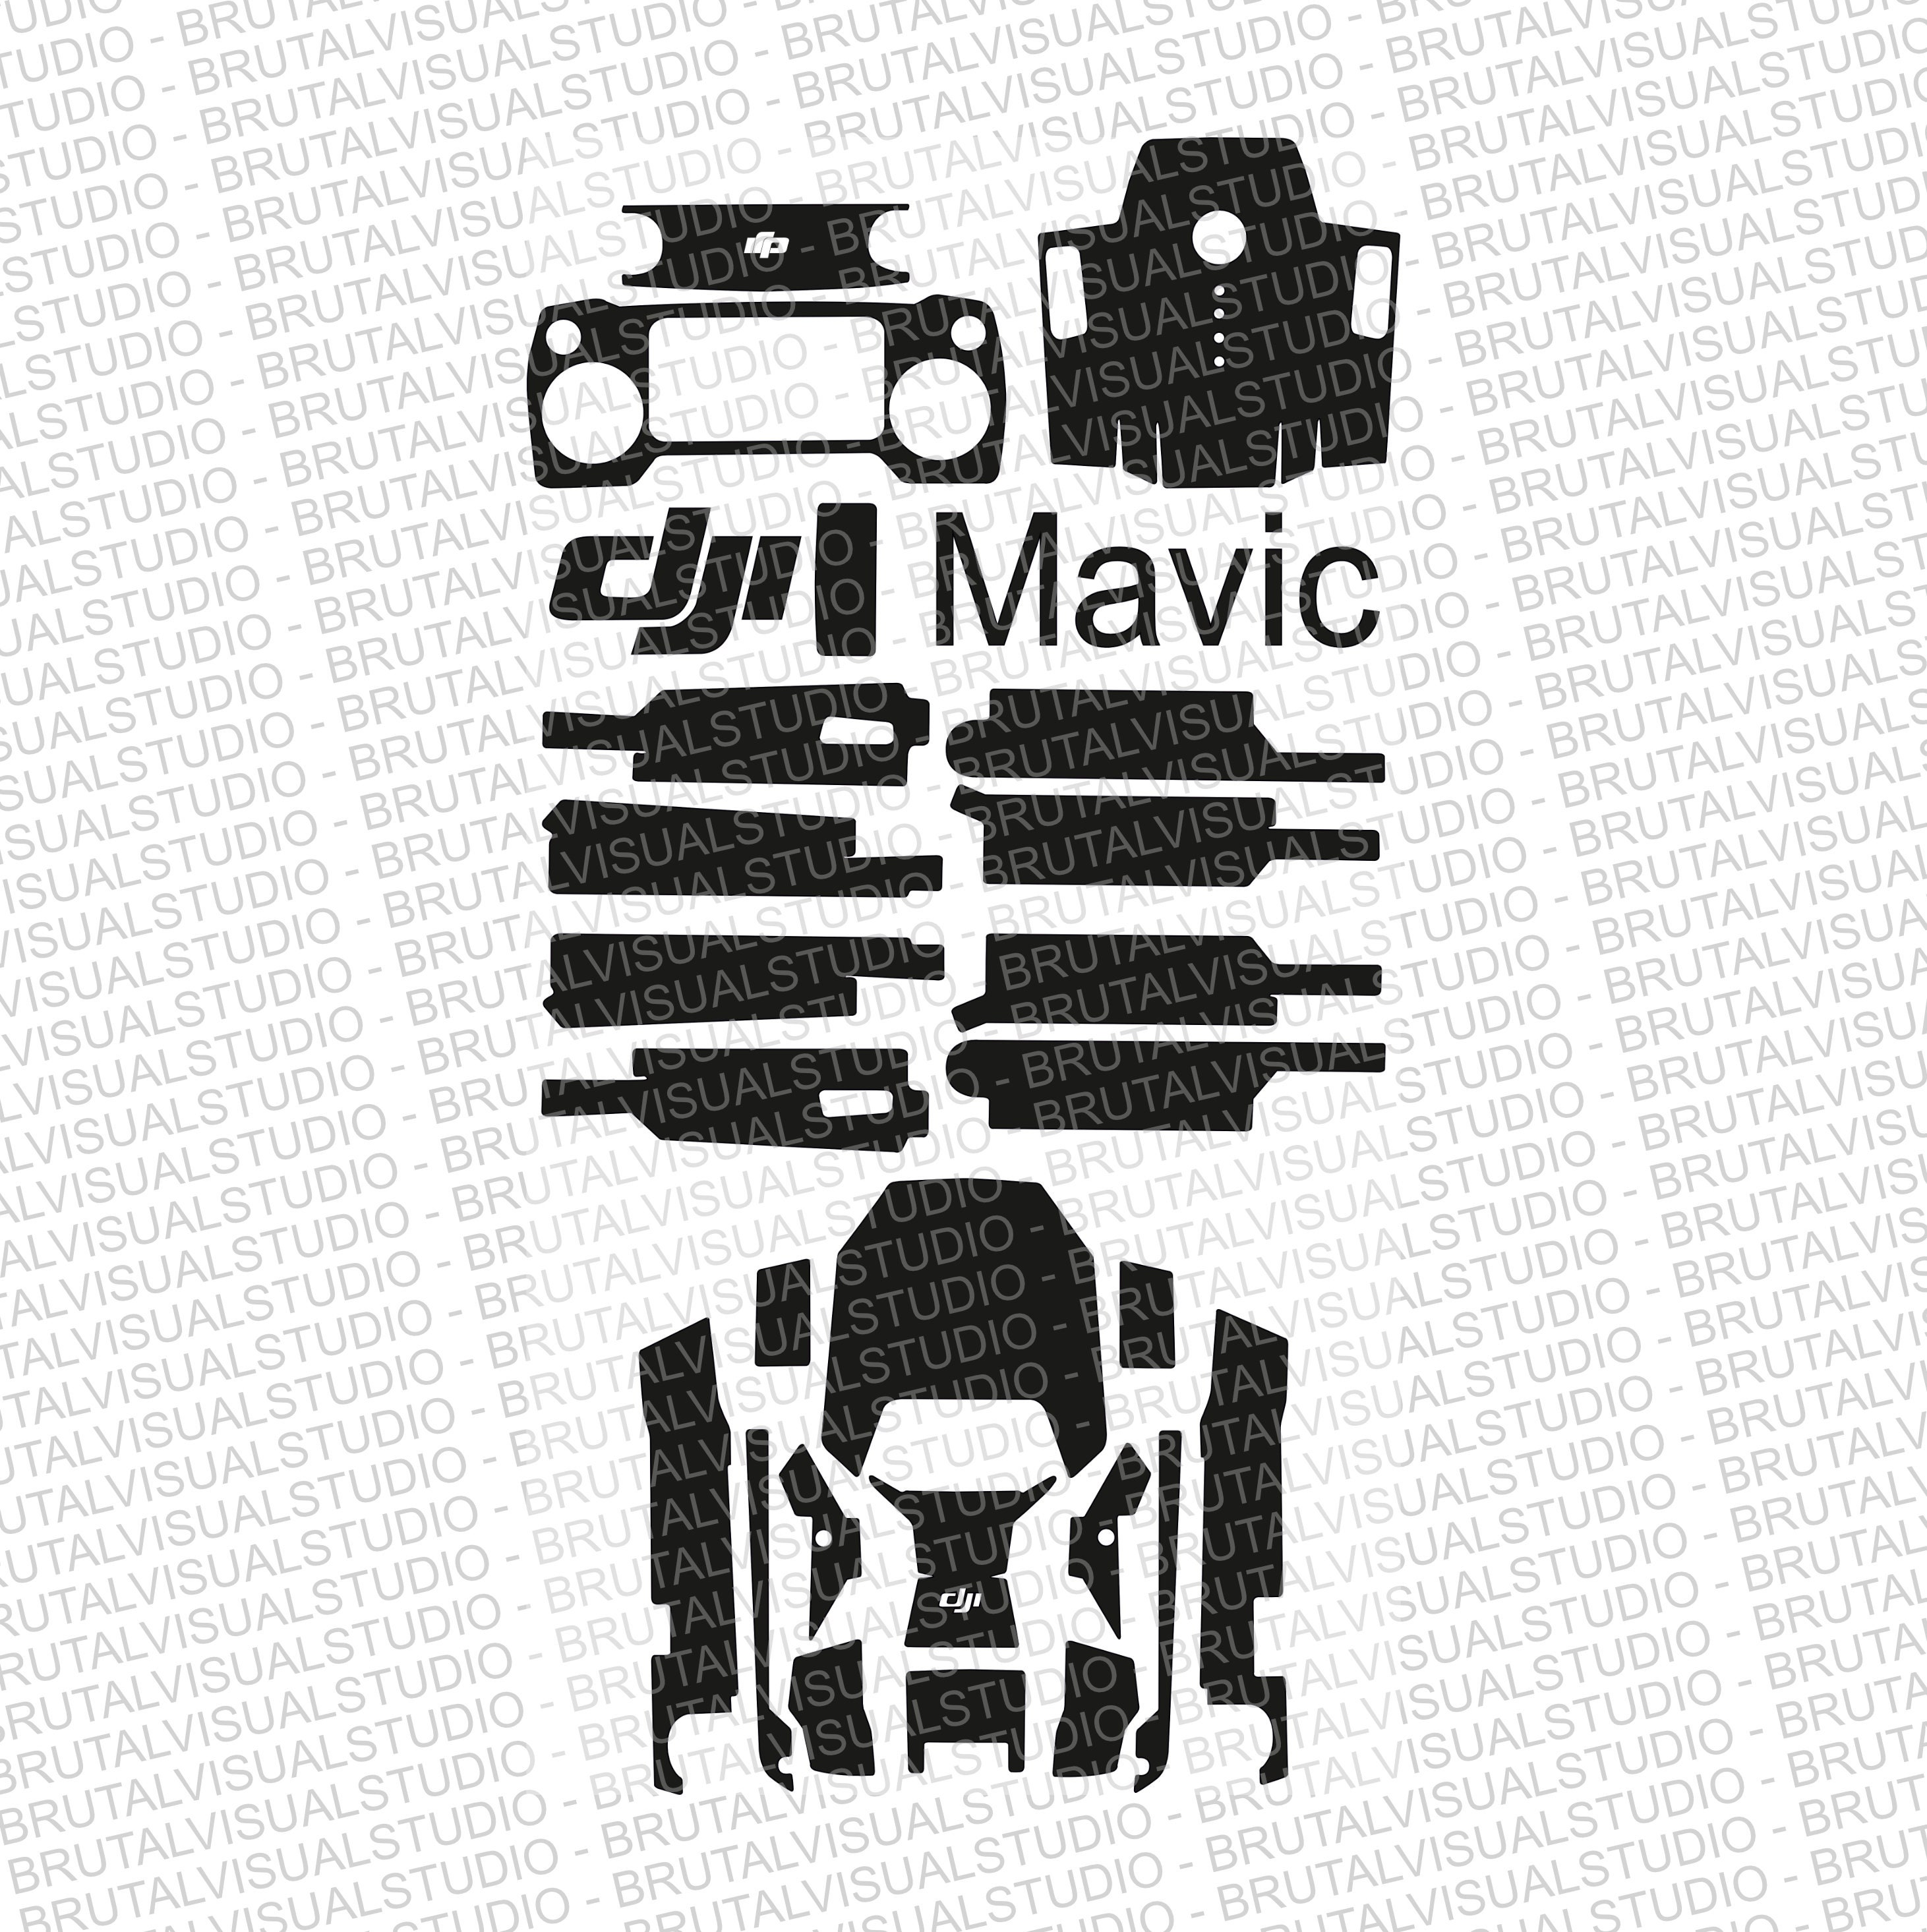 DJI Mavic Pro - Skin Cut Template - Templates for cut or machining ...